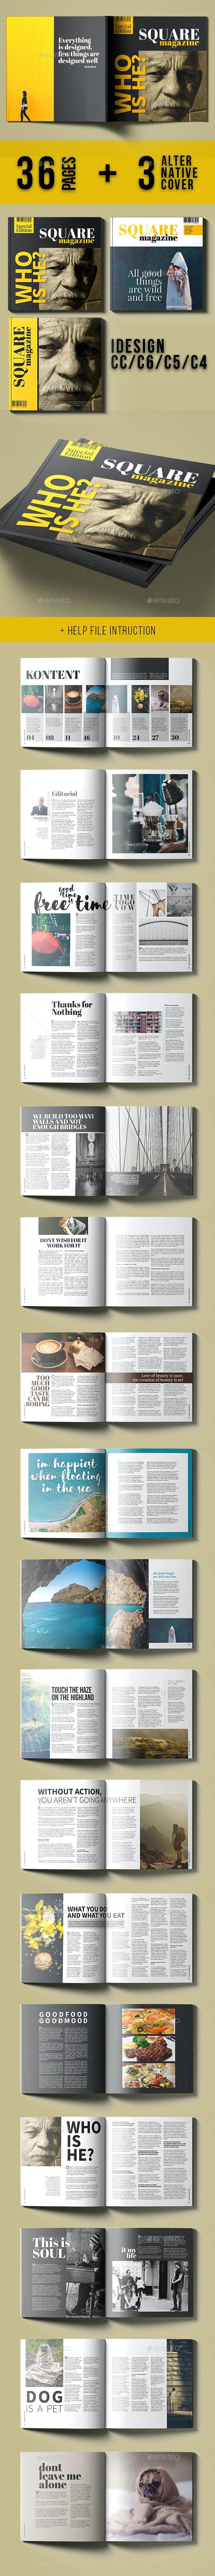 Square Magazine - Magazines Print Templates